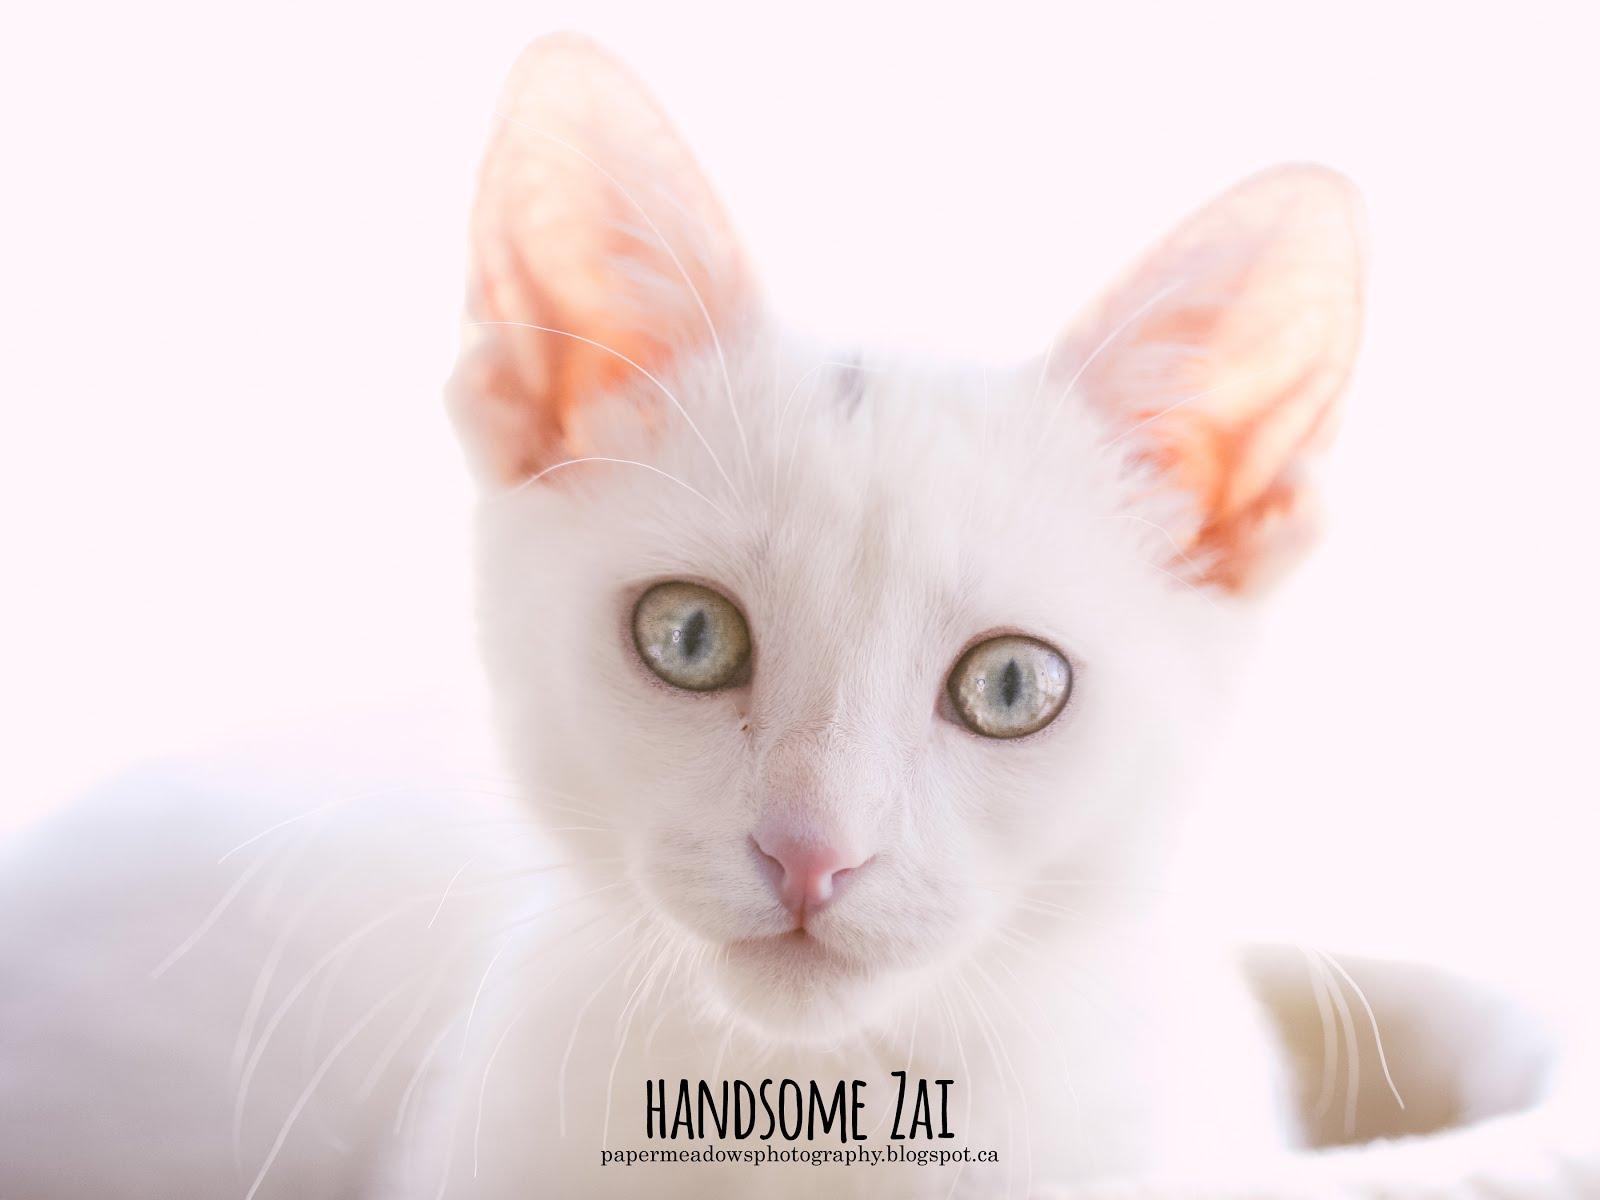 Handsome Zai!